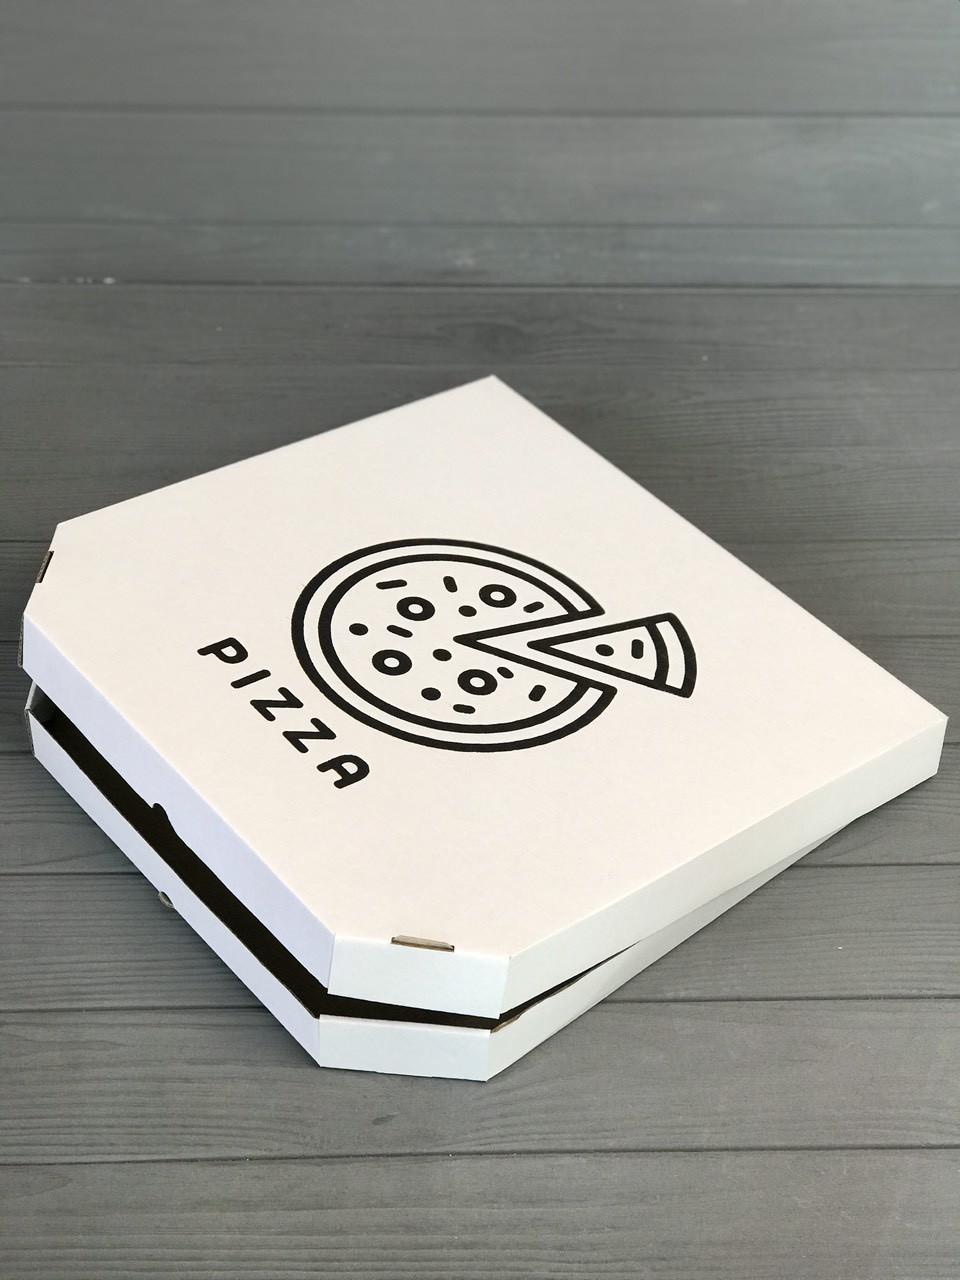 Коробка для пиццы с рисунком Pizza 250х250х30 мм (Чёрная печать)